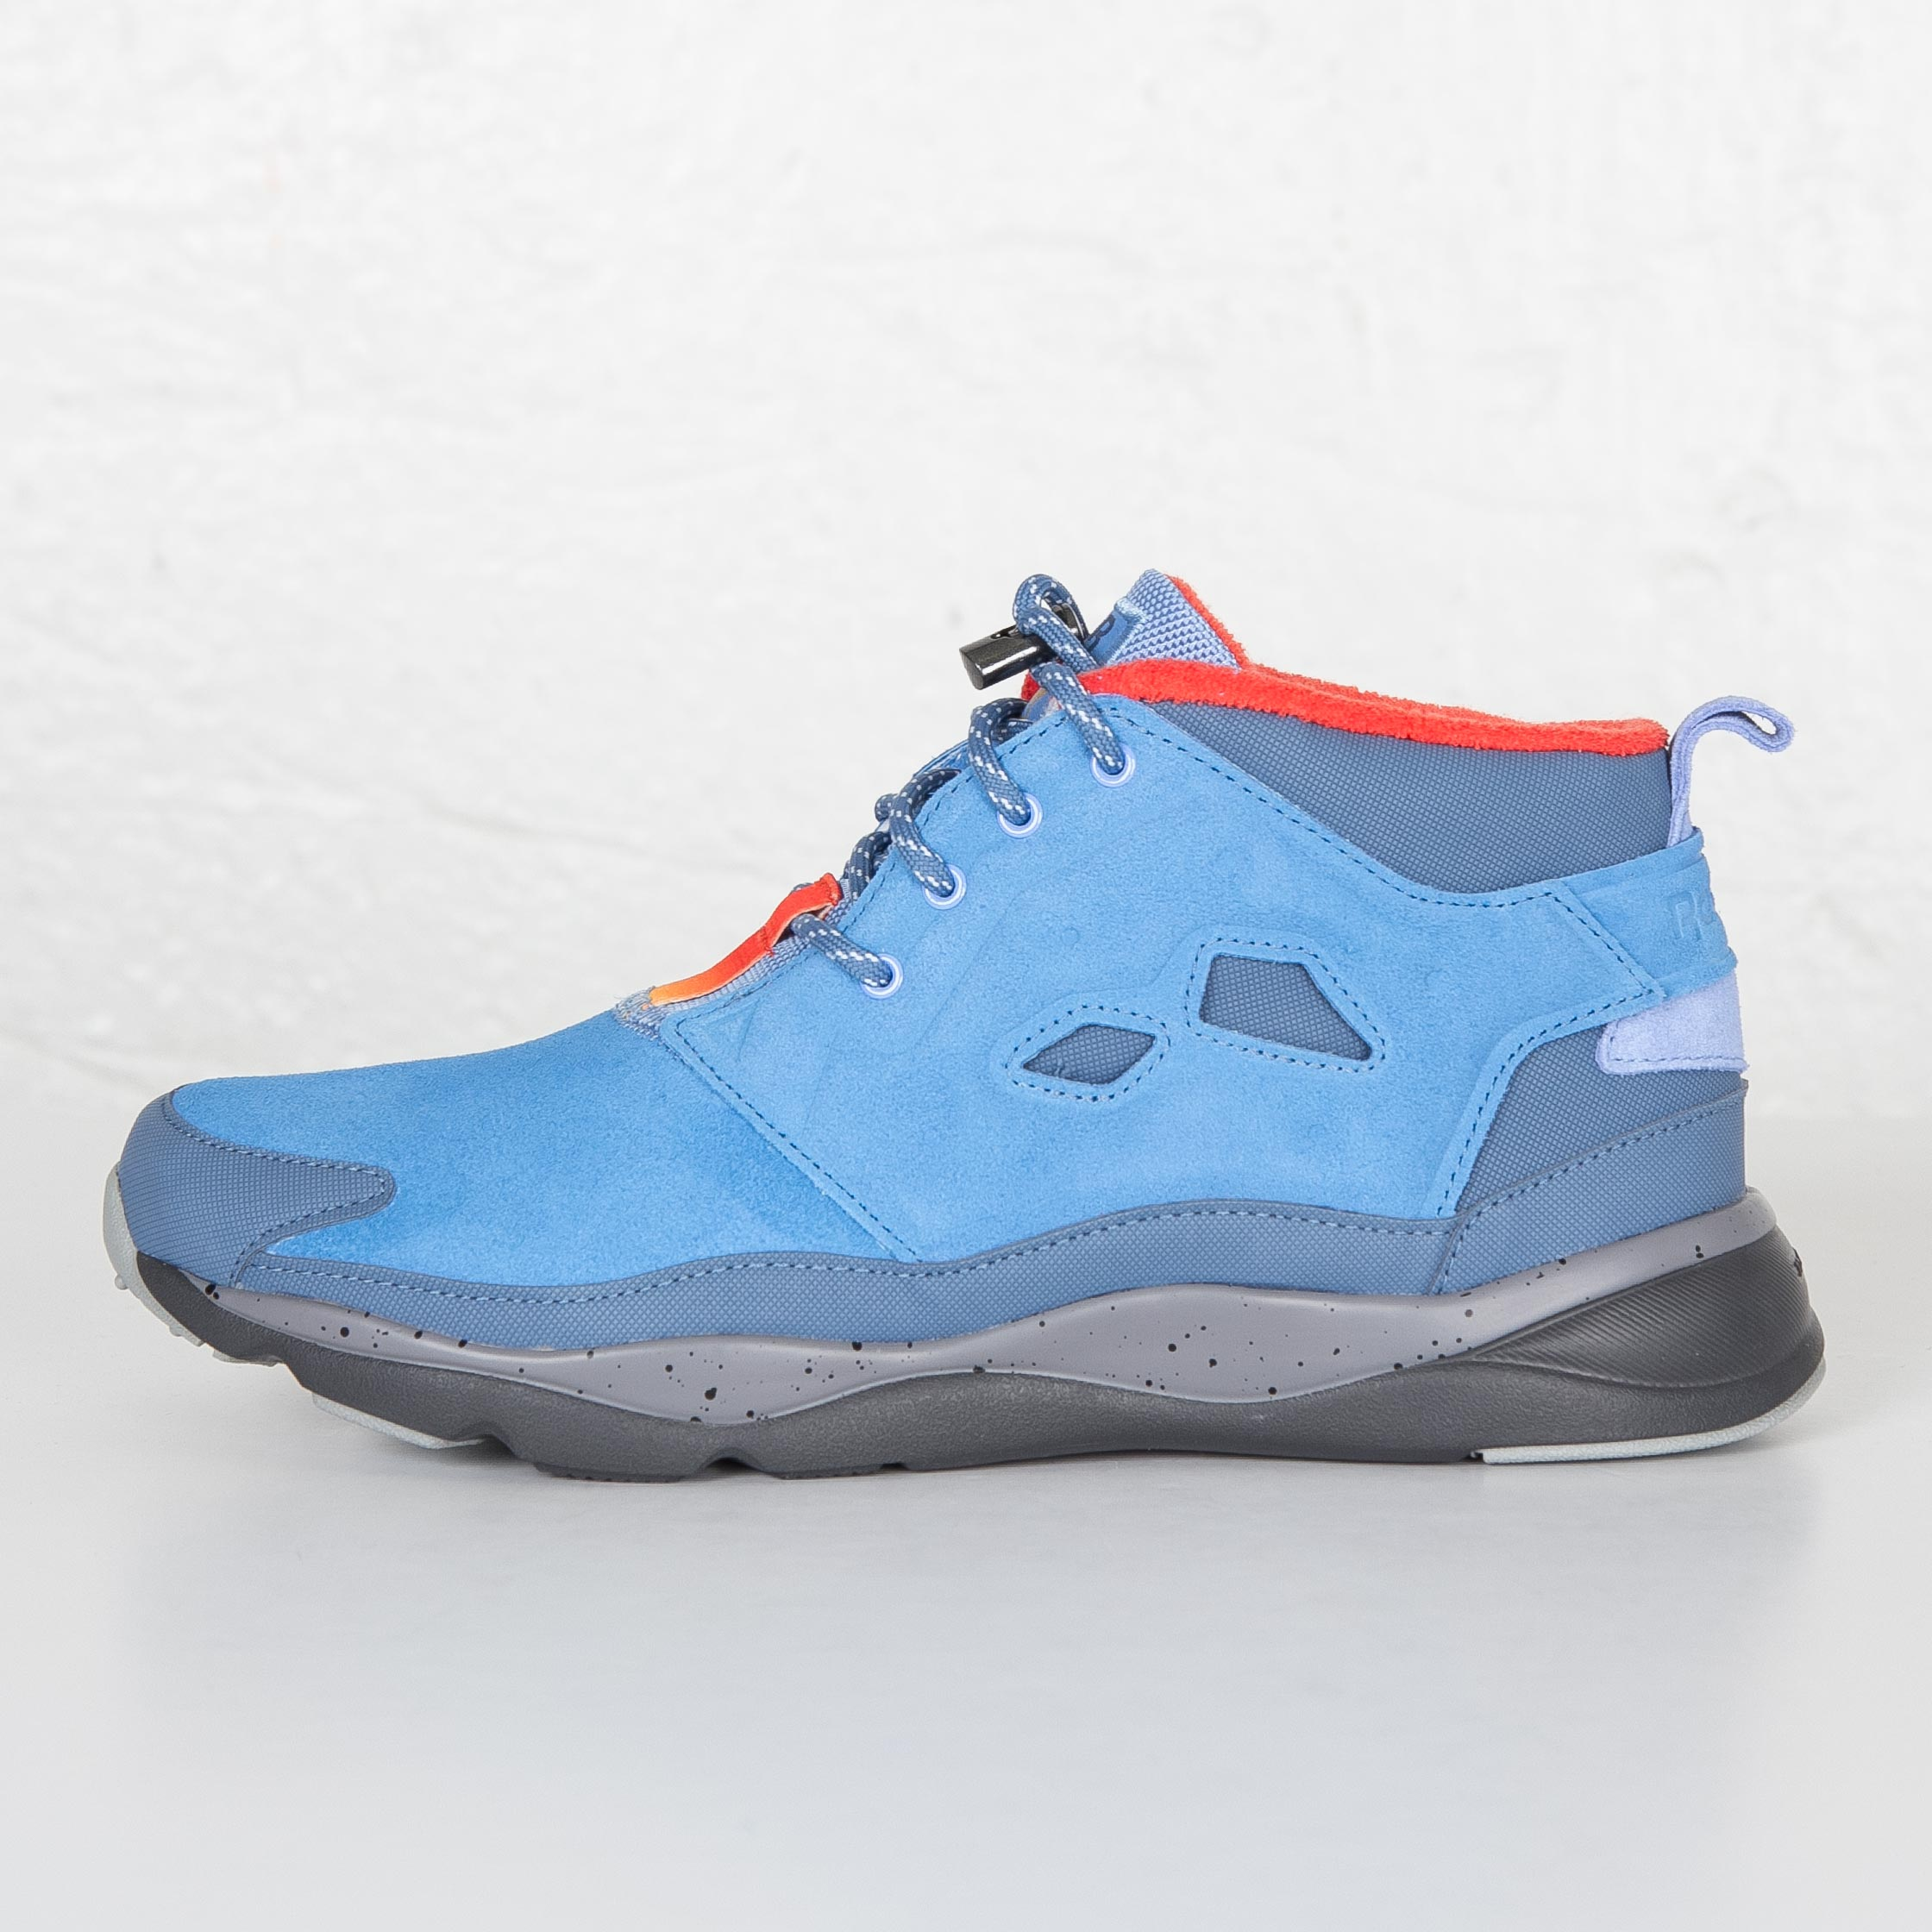 66e351502a3a8 Reebok Furylite Chukka CN - Ar1664 - Sneakersnstuff